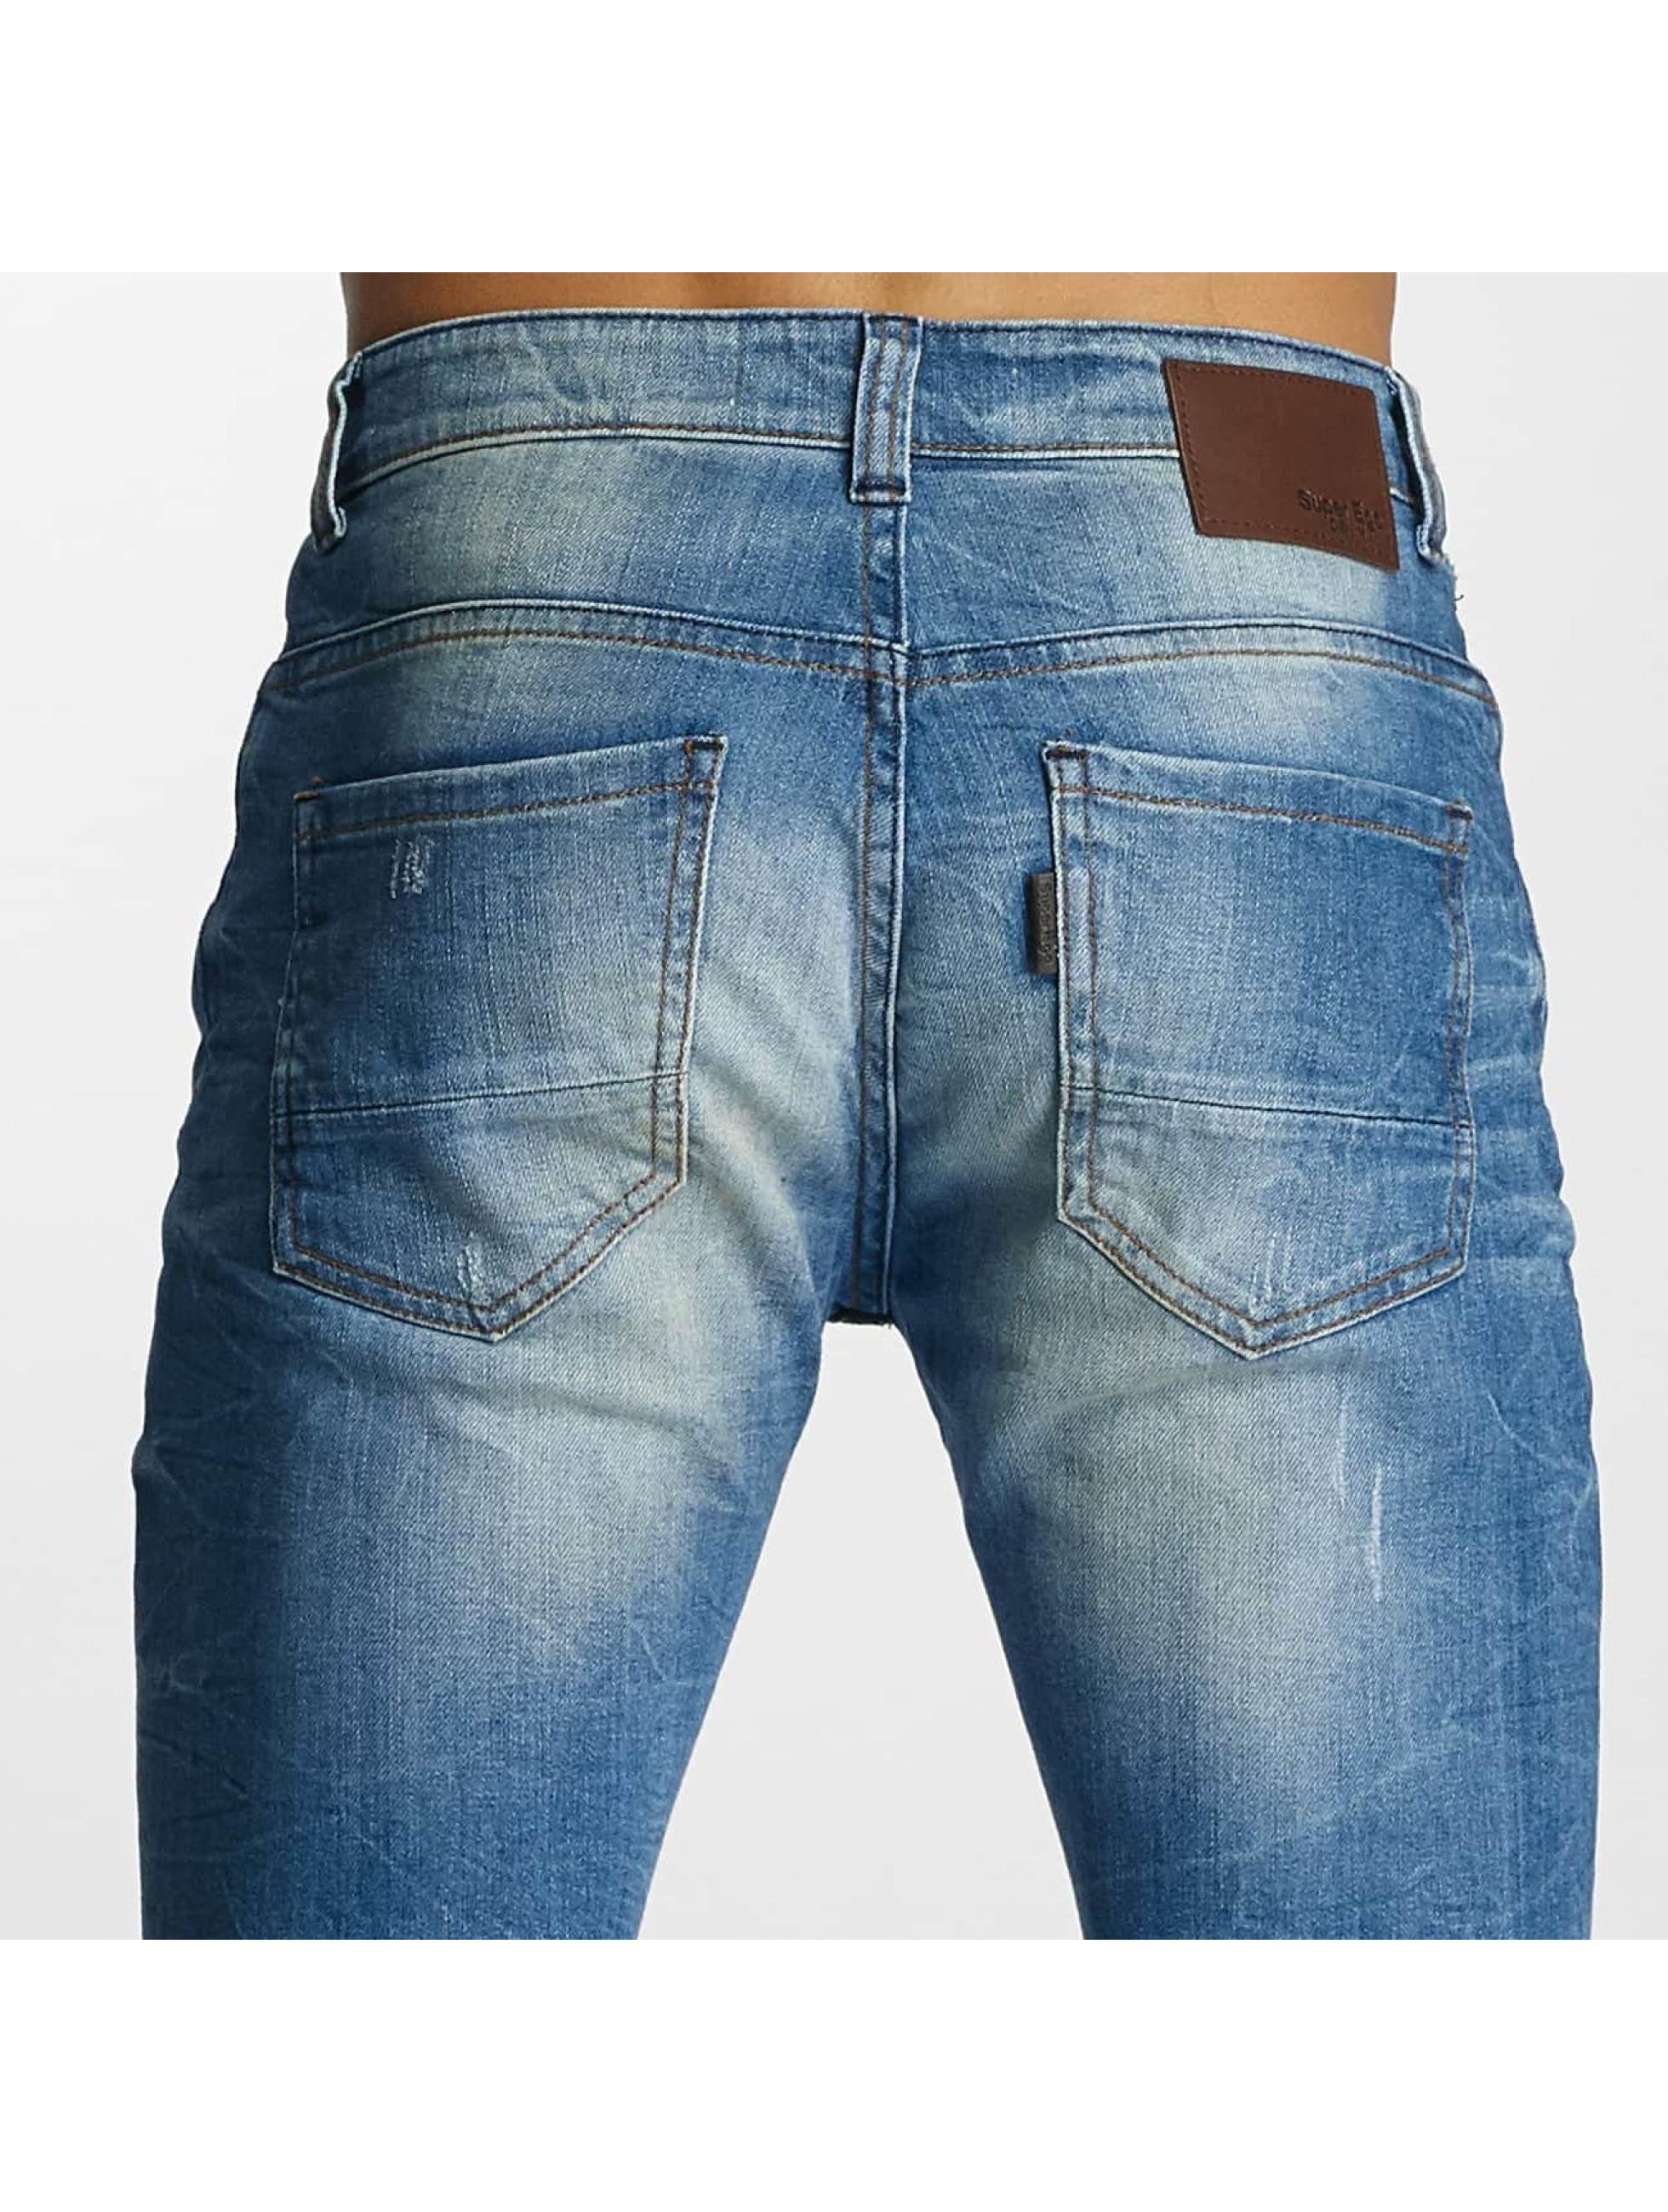 Paris Premium Dżinsy straight fit Dirt niebieski